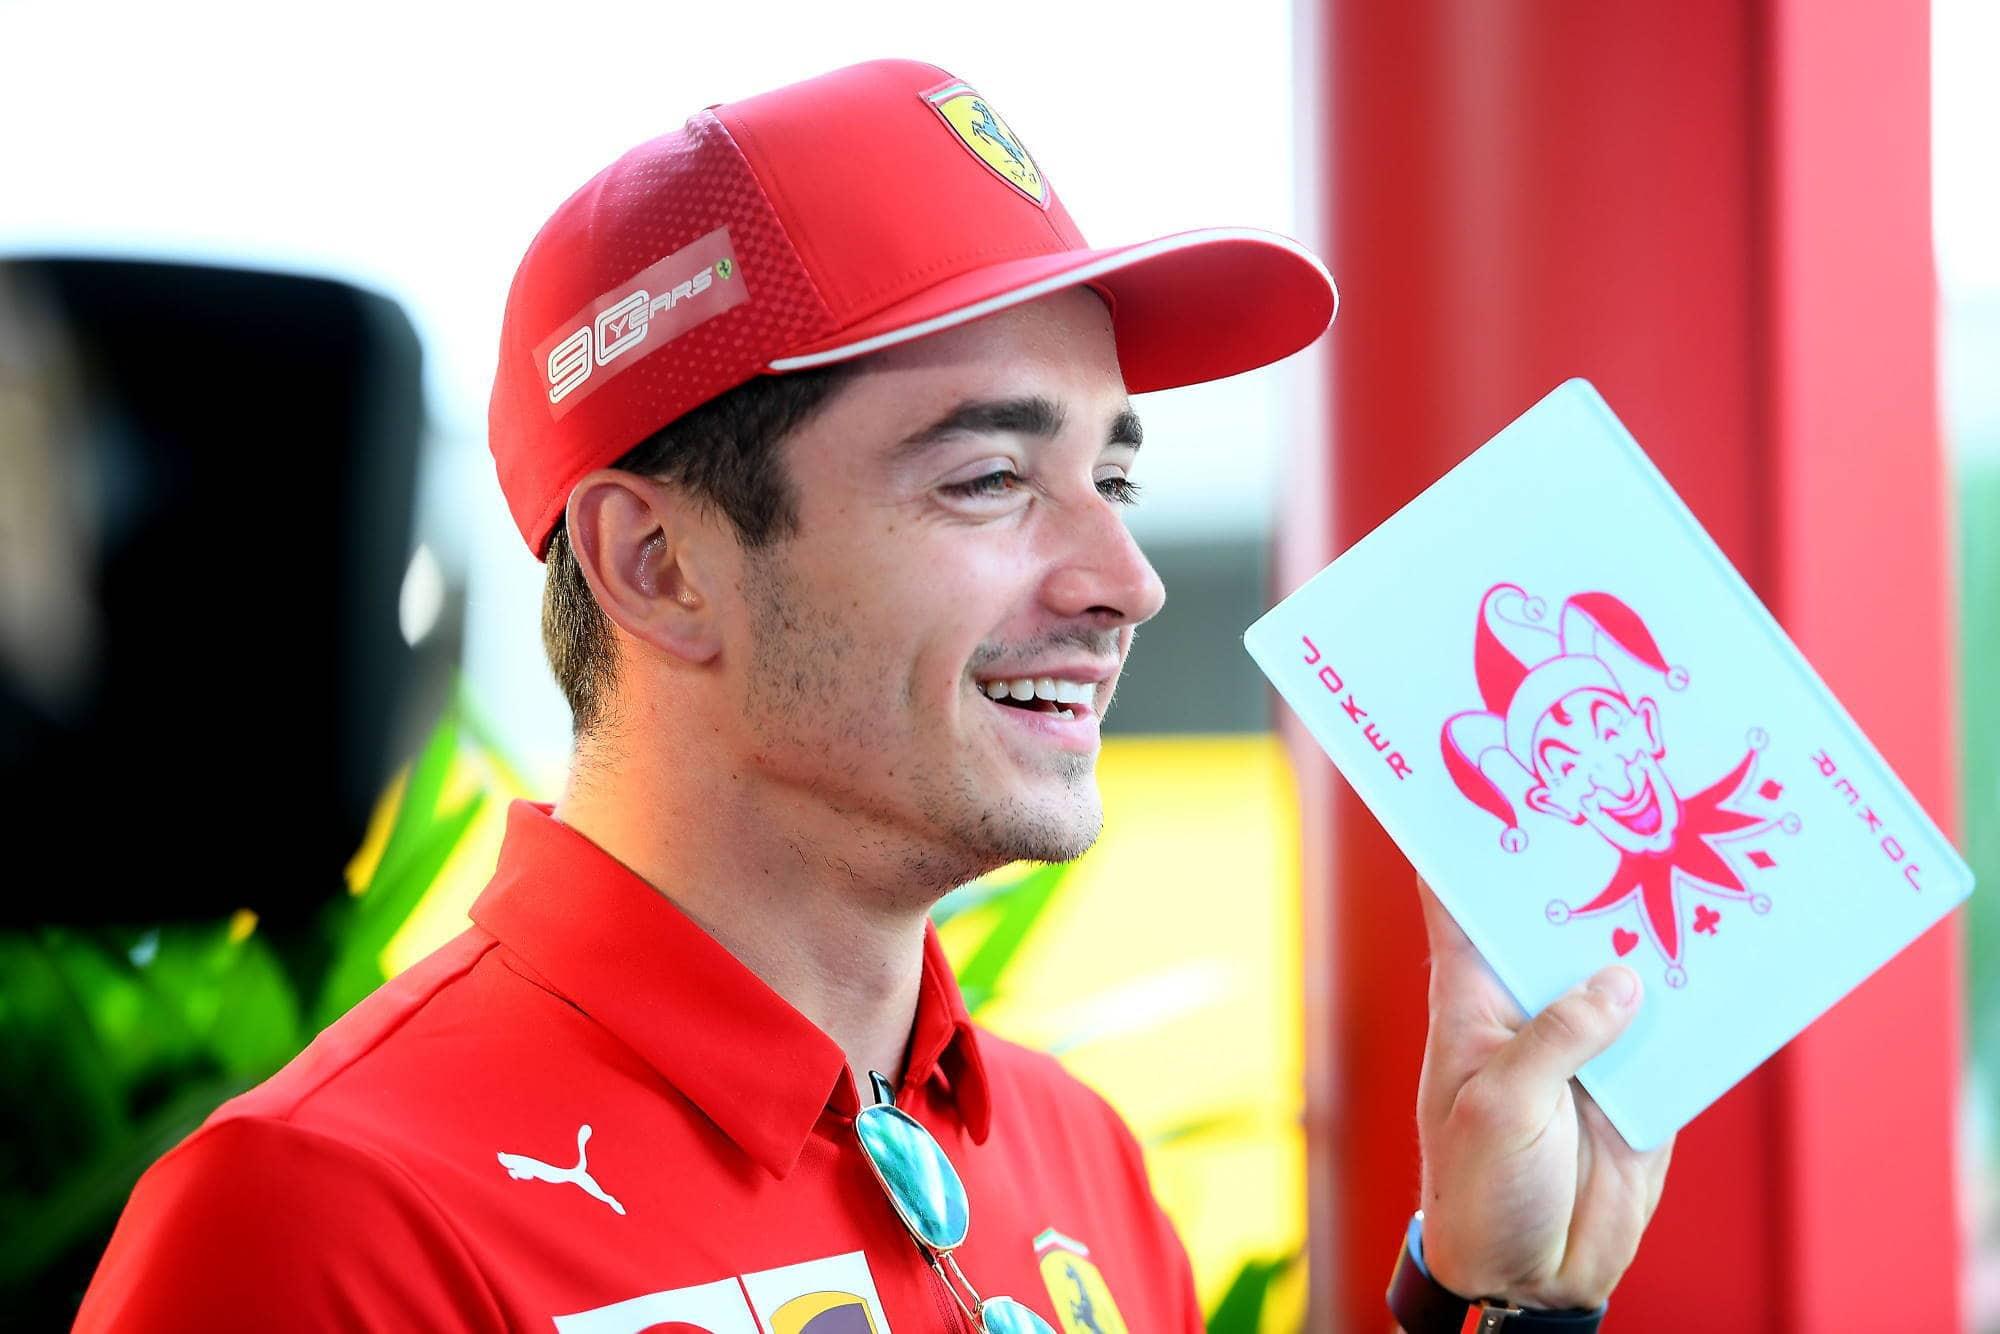 Charles Leclerc Ferrari SF90 Singapore GP F1 2019 Joker card Photo Ferrari